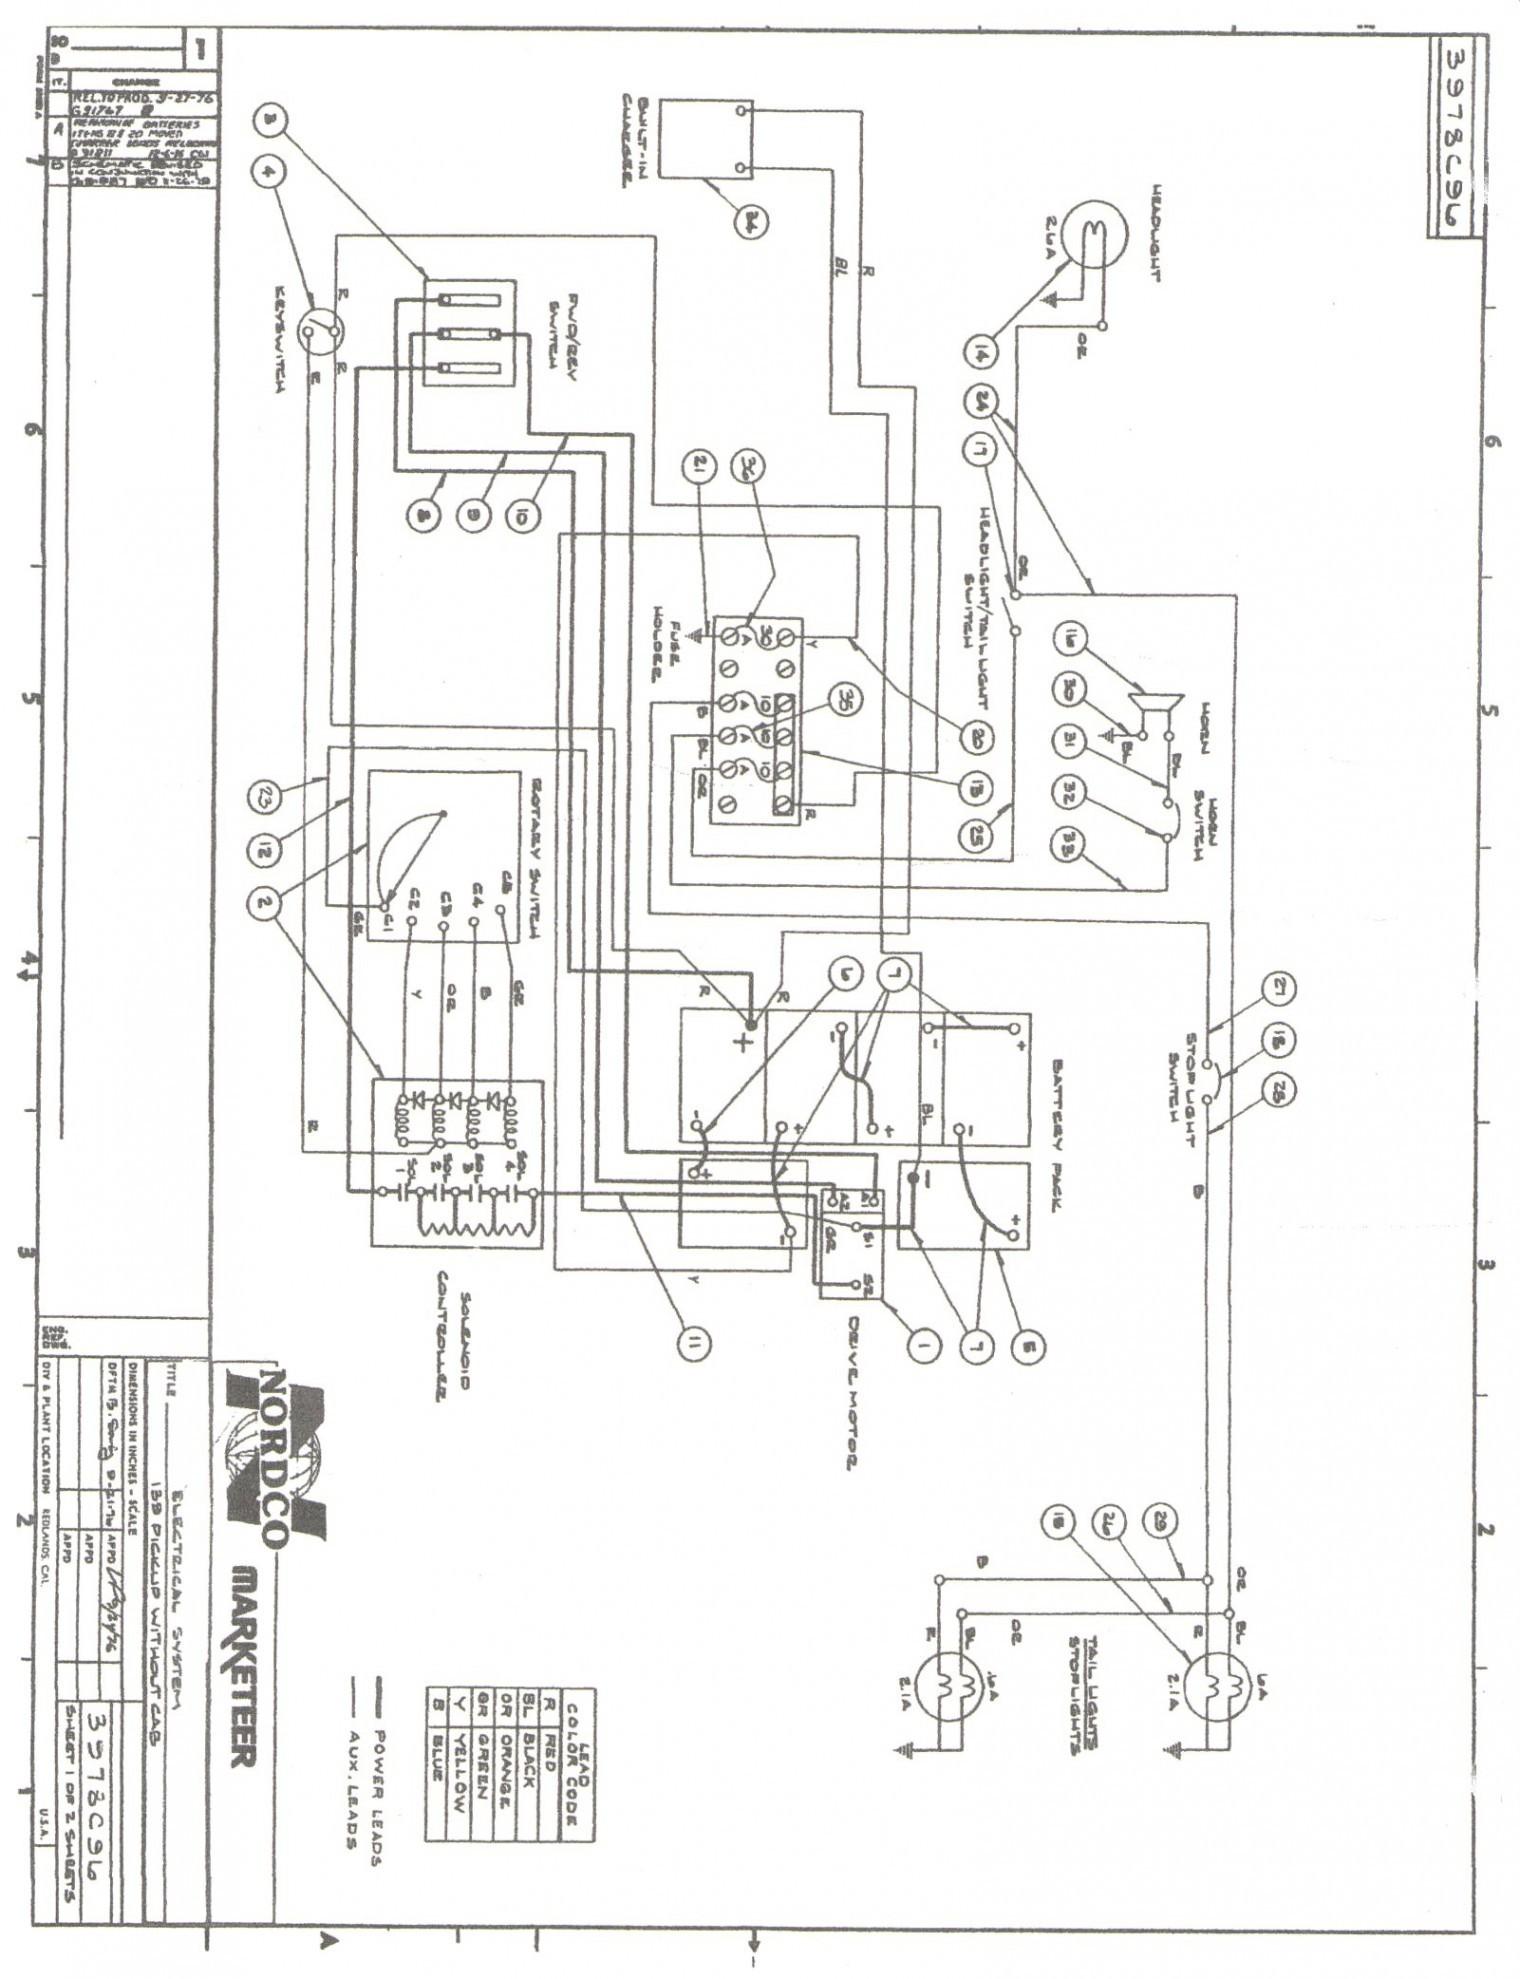 Wiring Diagram for Ez Go Golf Cart Inspirational Wiring Diagram Ez Go Electric Golf Cart New Ezgo Golf Cart Wiring